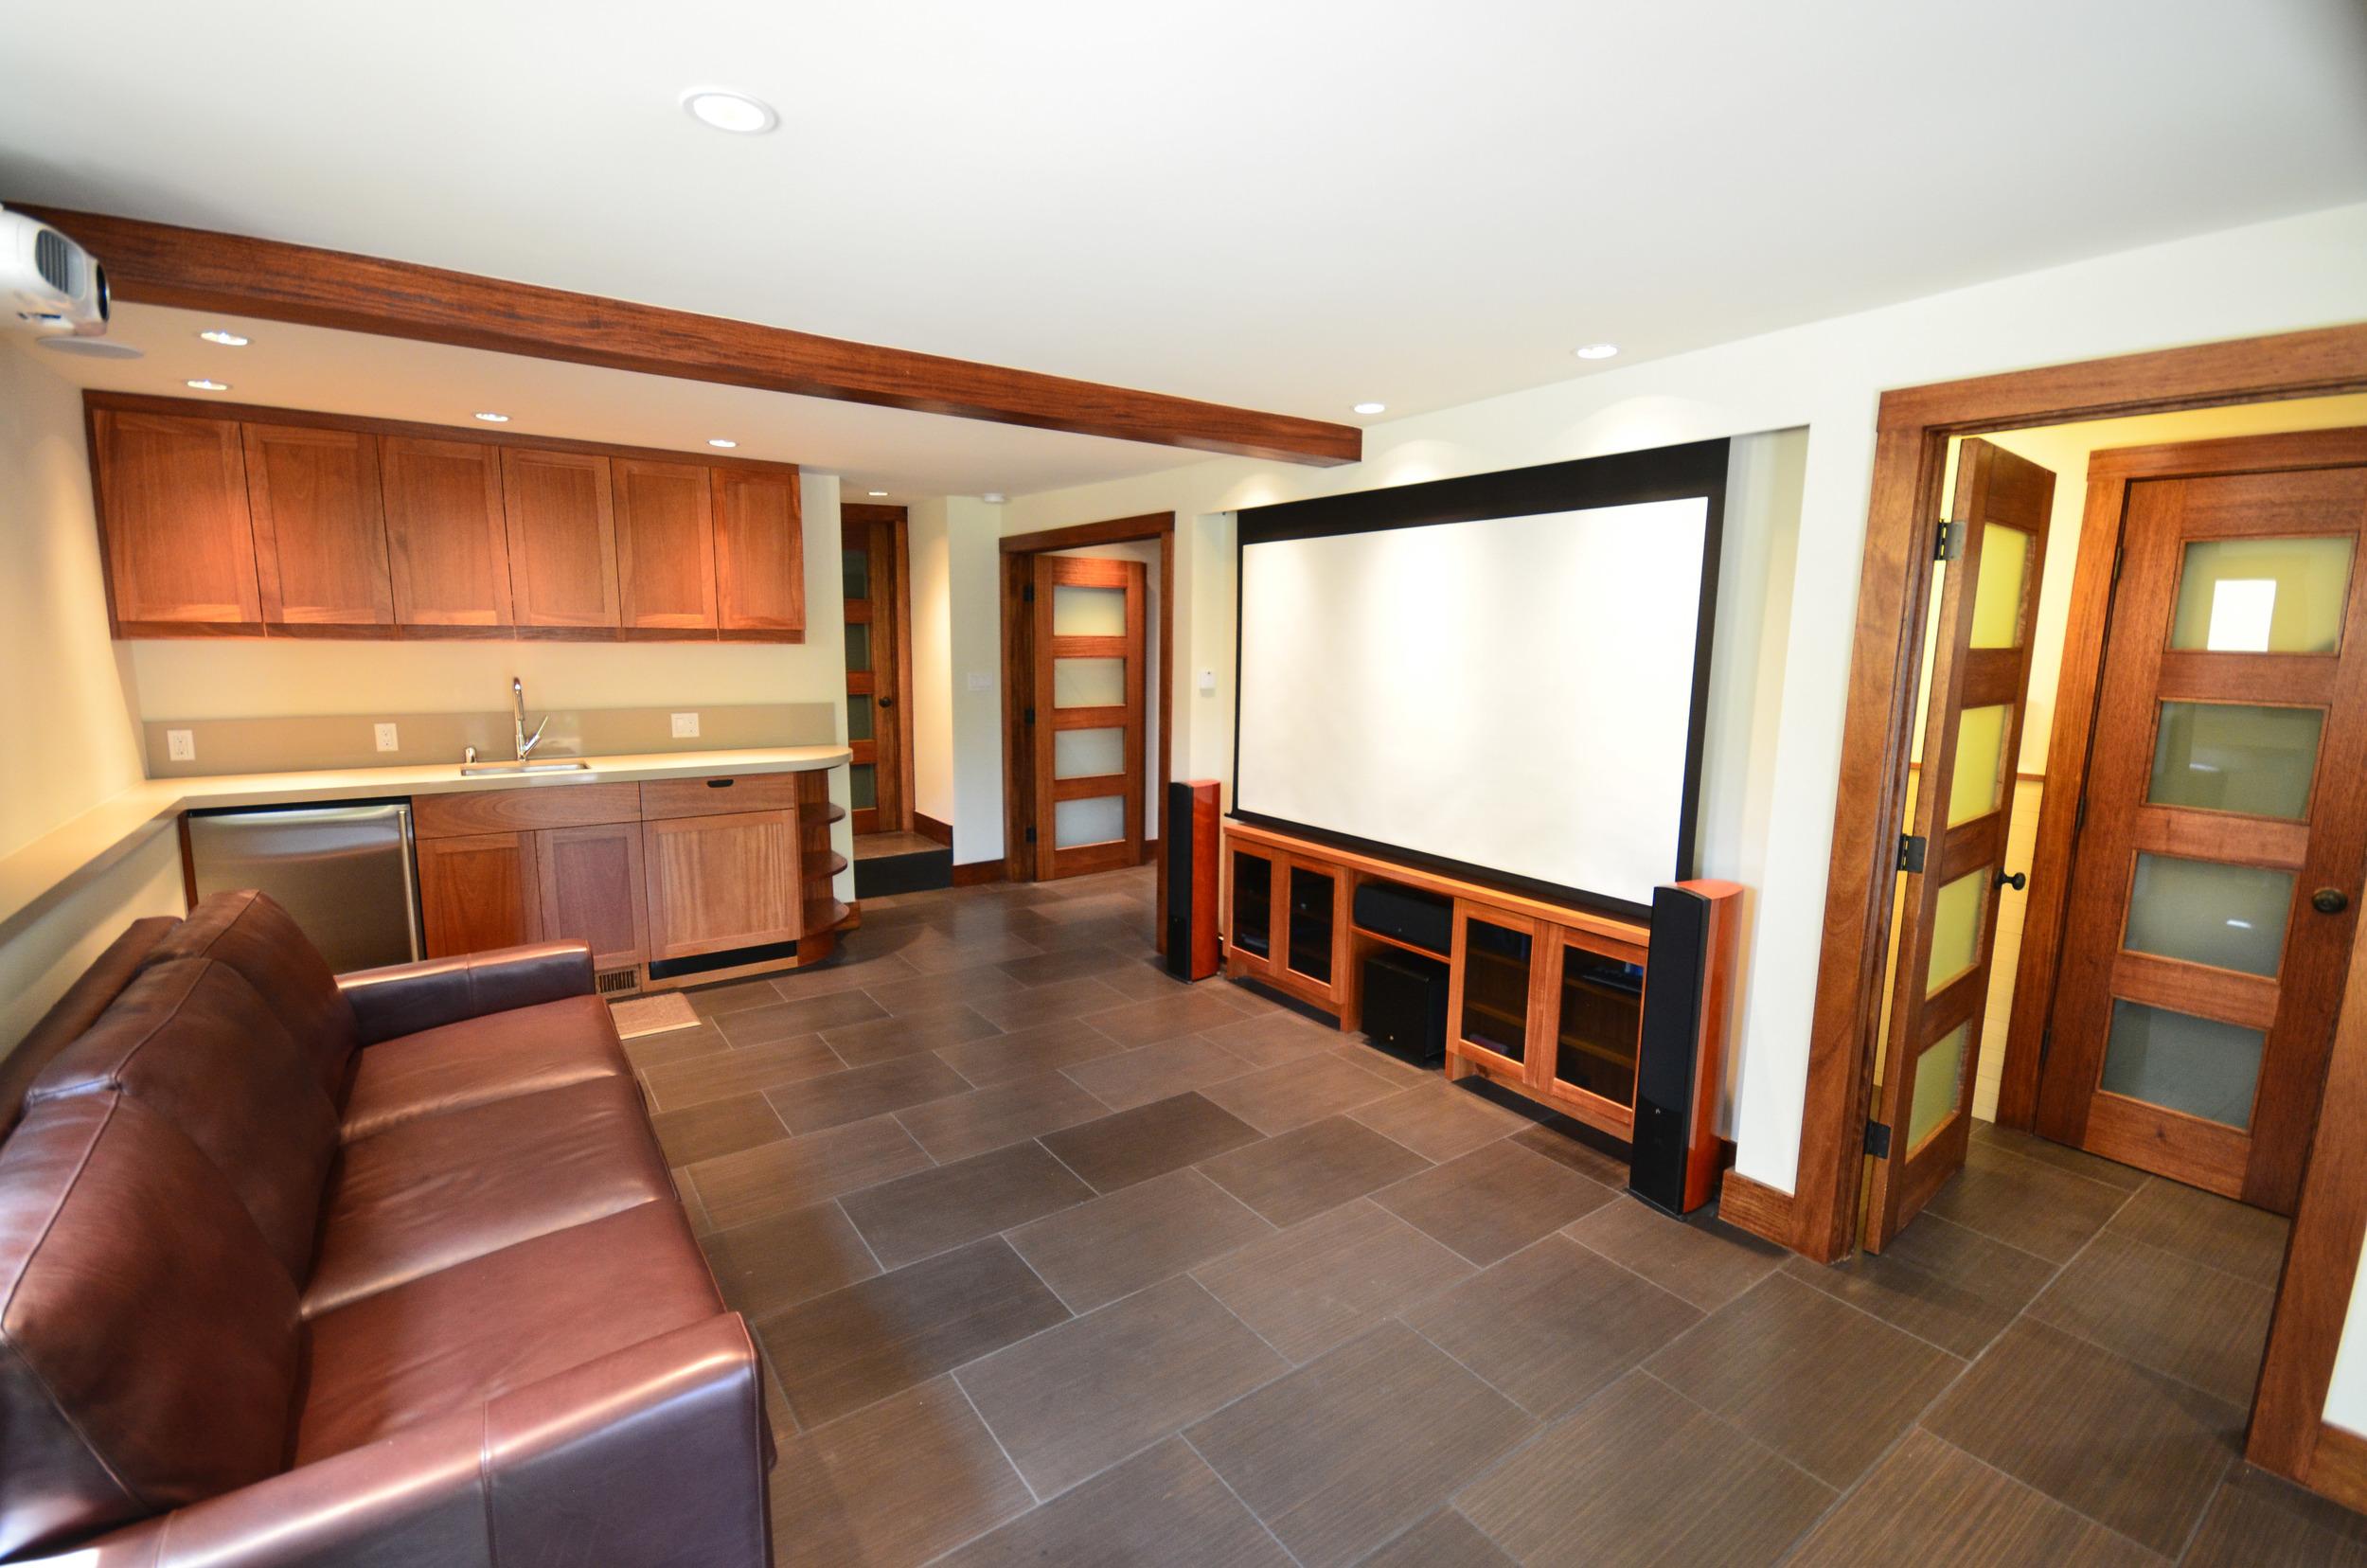 traditional face frame mahogany cabinets